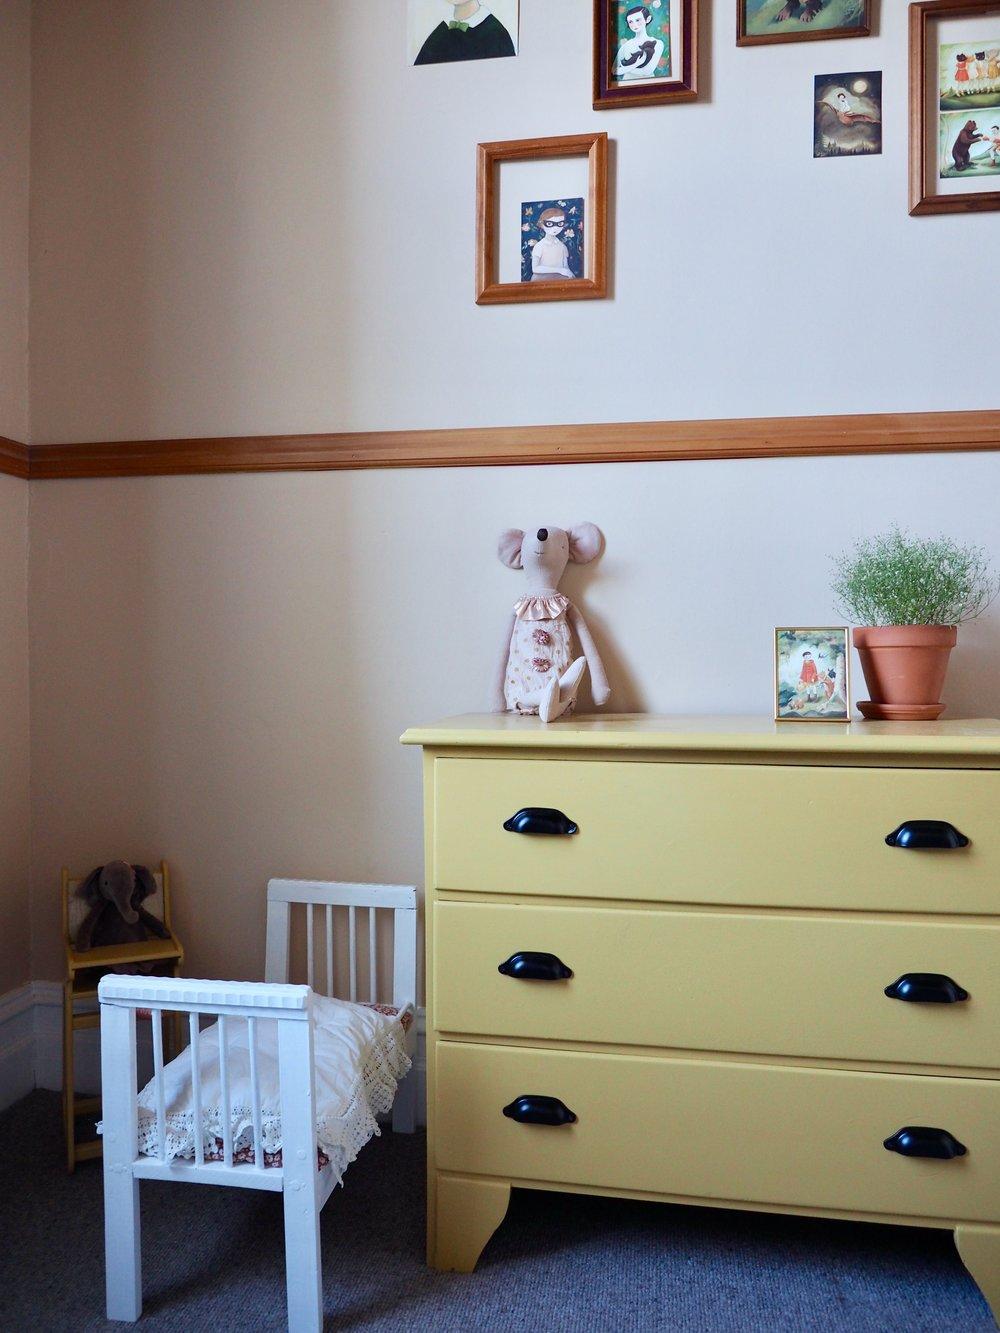 Pearson + Projects Shared Kids Bedroom Sand Resene - 41.jpg